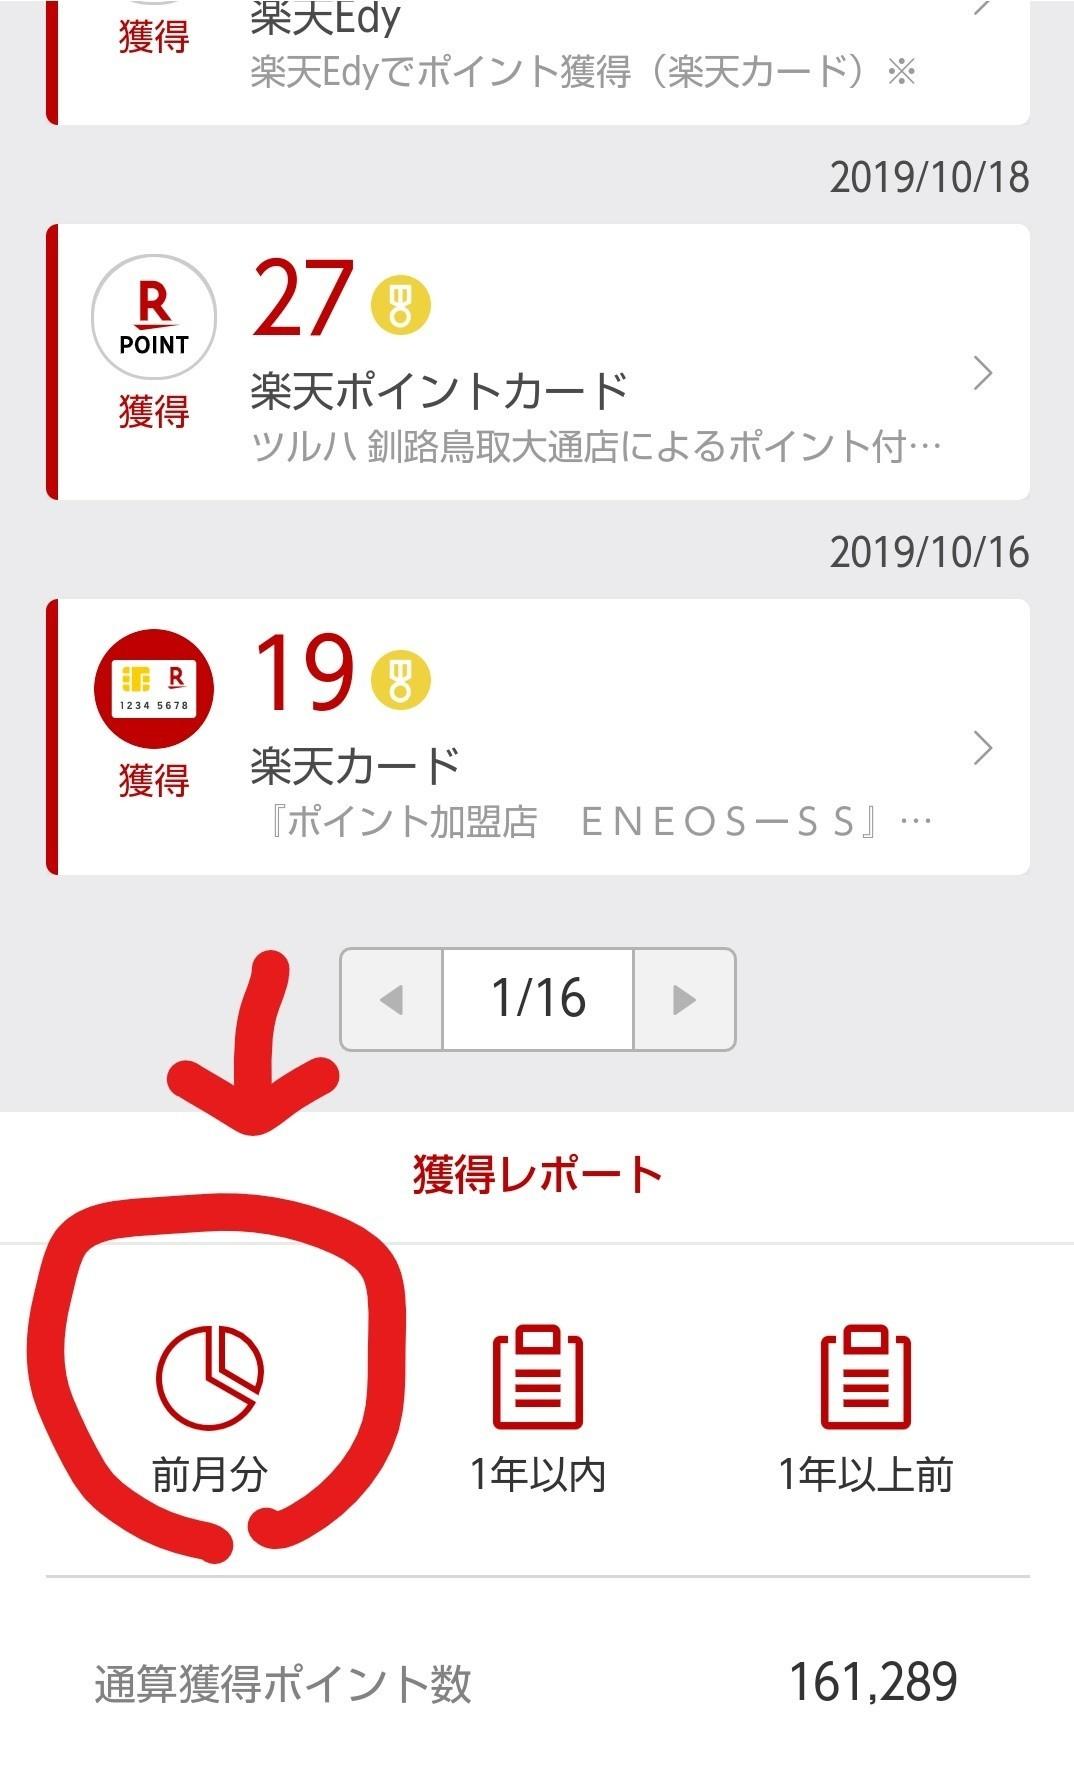 Inked楽天ポイント10月実績モバイルログイン③_LI